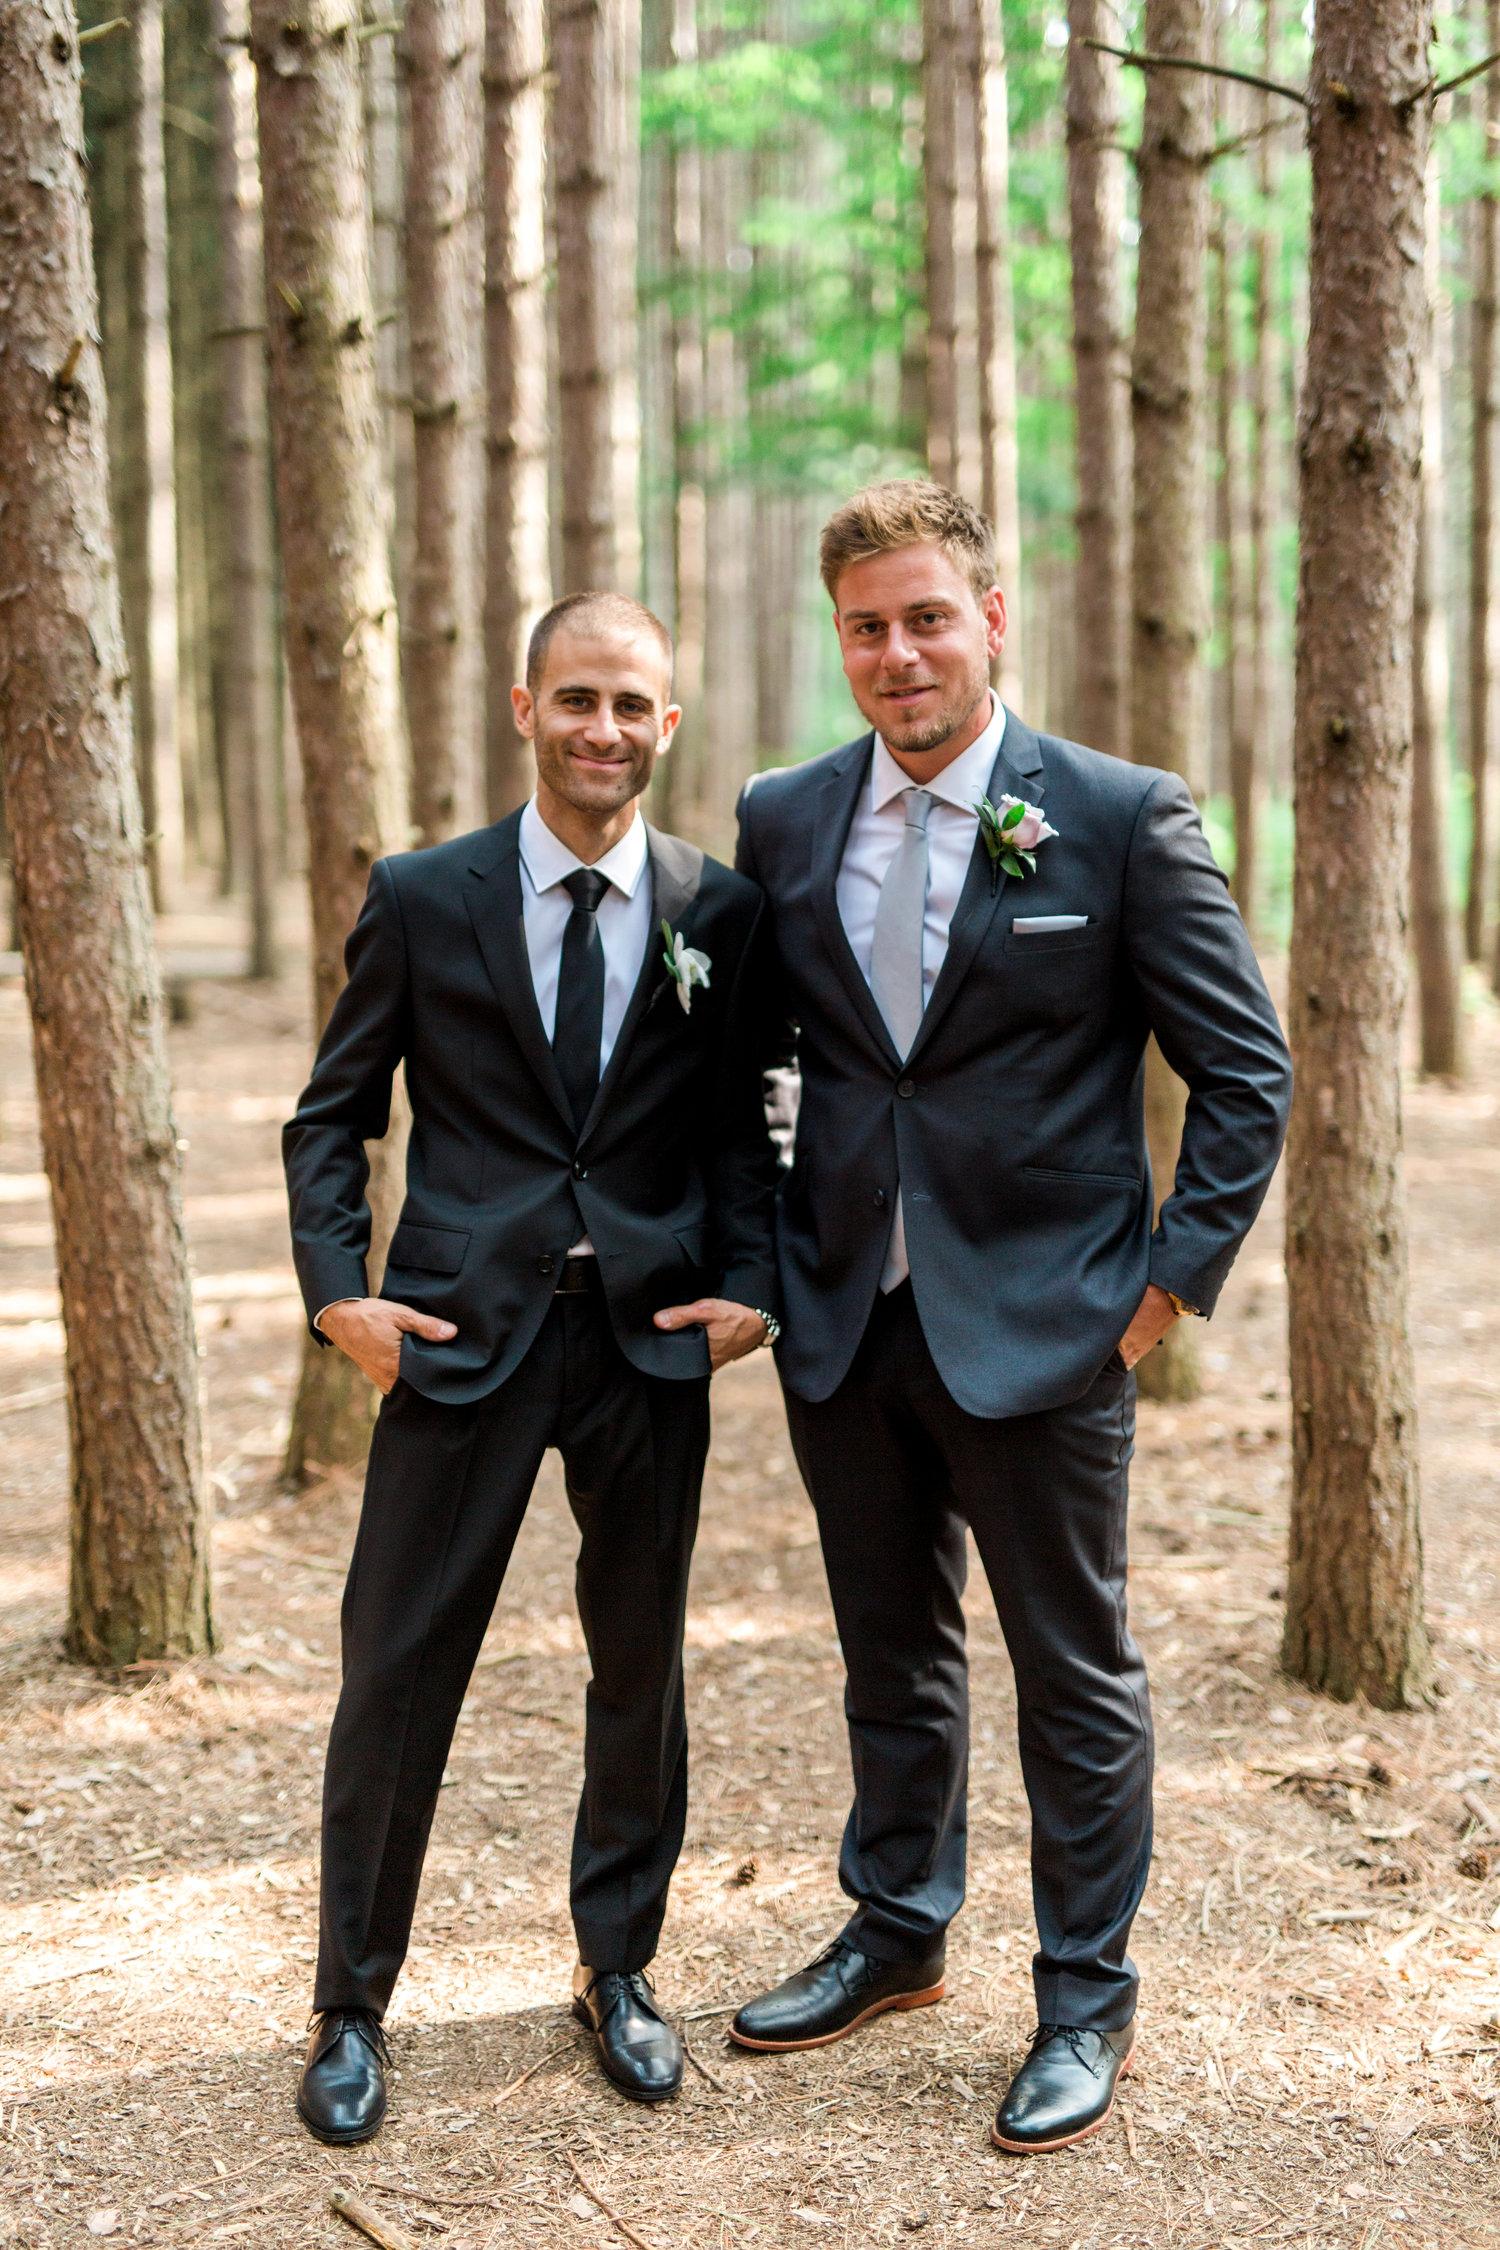 Danielle-Giroux-Amir-Golbazi-Toronto-Wedding-Photographer-Bellvue-Manor_DeLuca_1-647.jpg